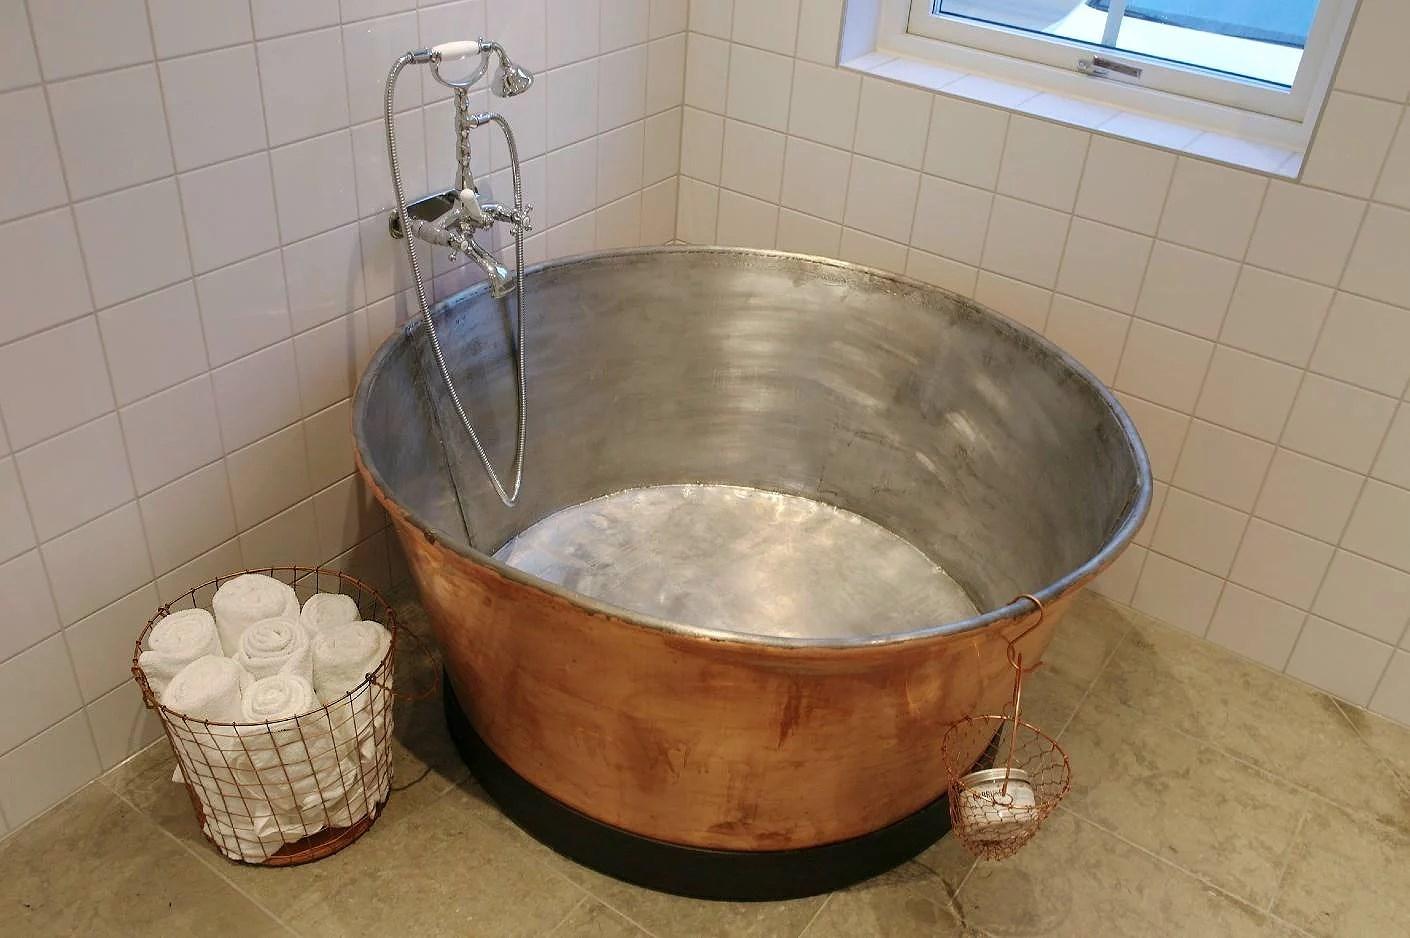 Mini Badkar Svensk Standard All Frvaring R Bra Frvaring Det Gller Ven Fr Placering Av